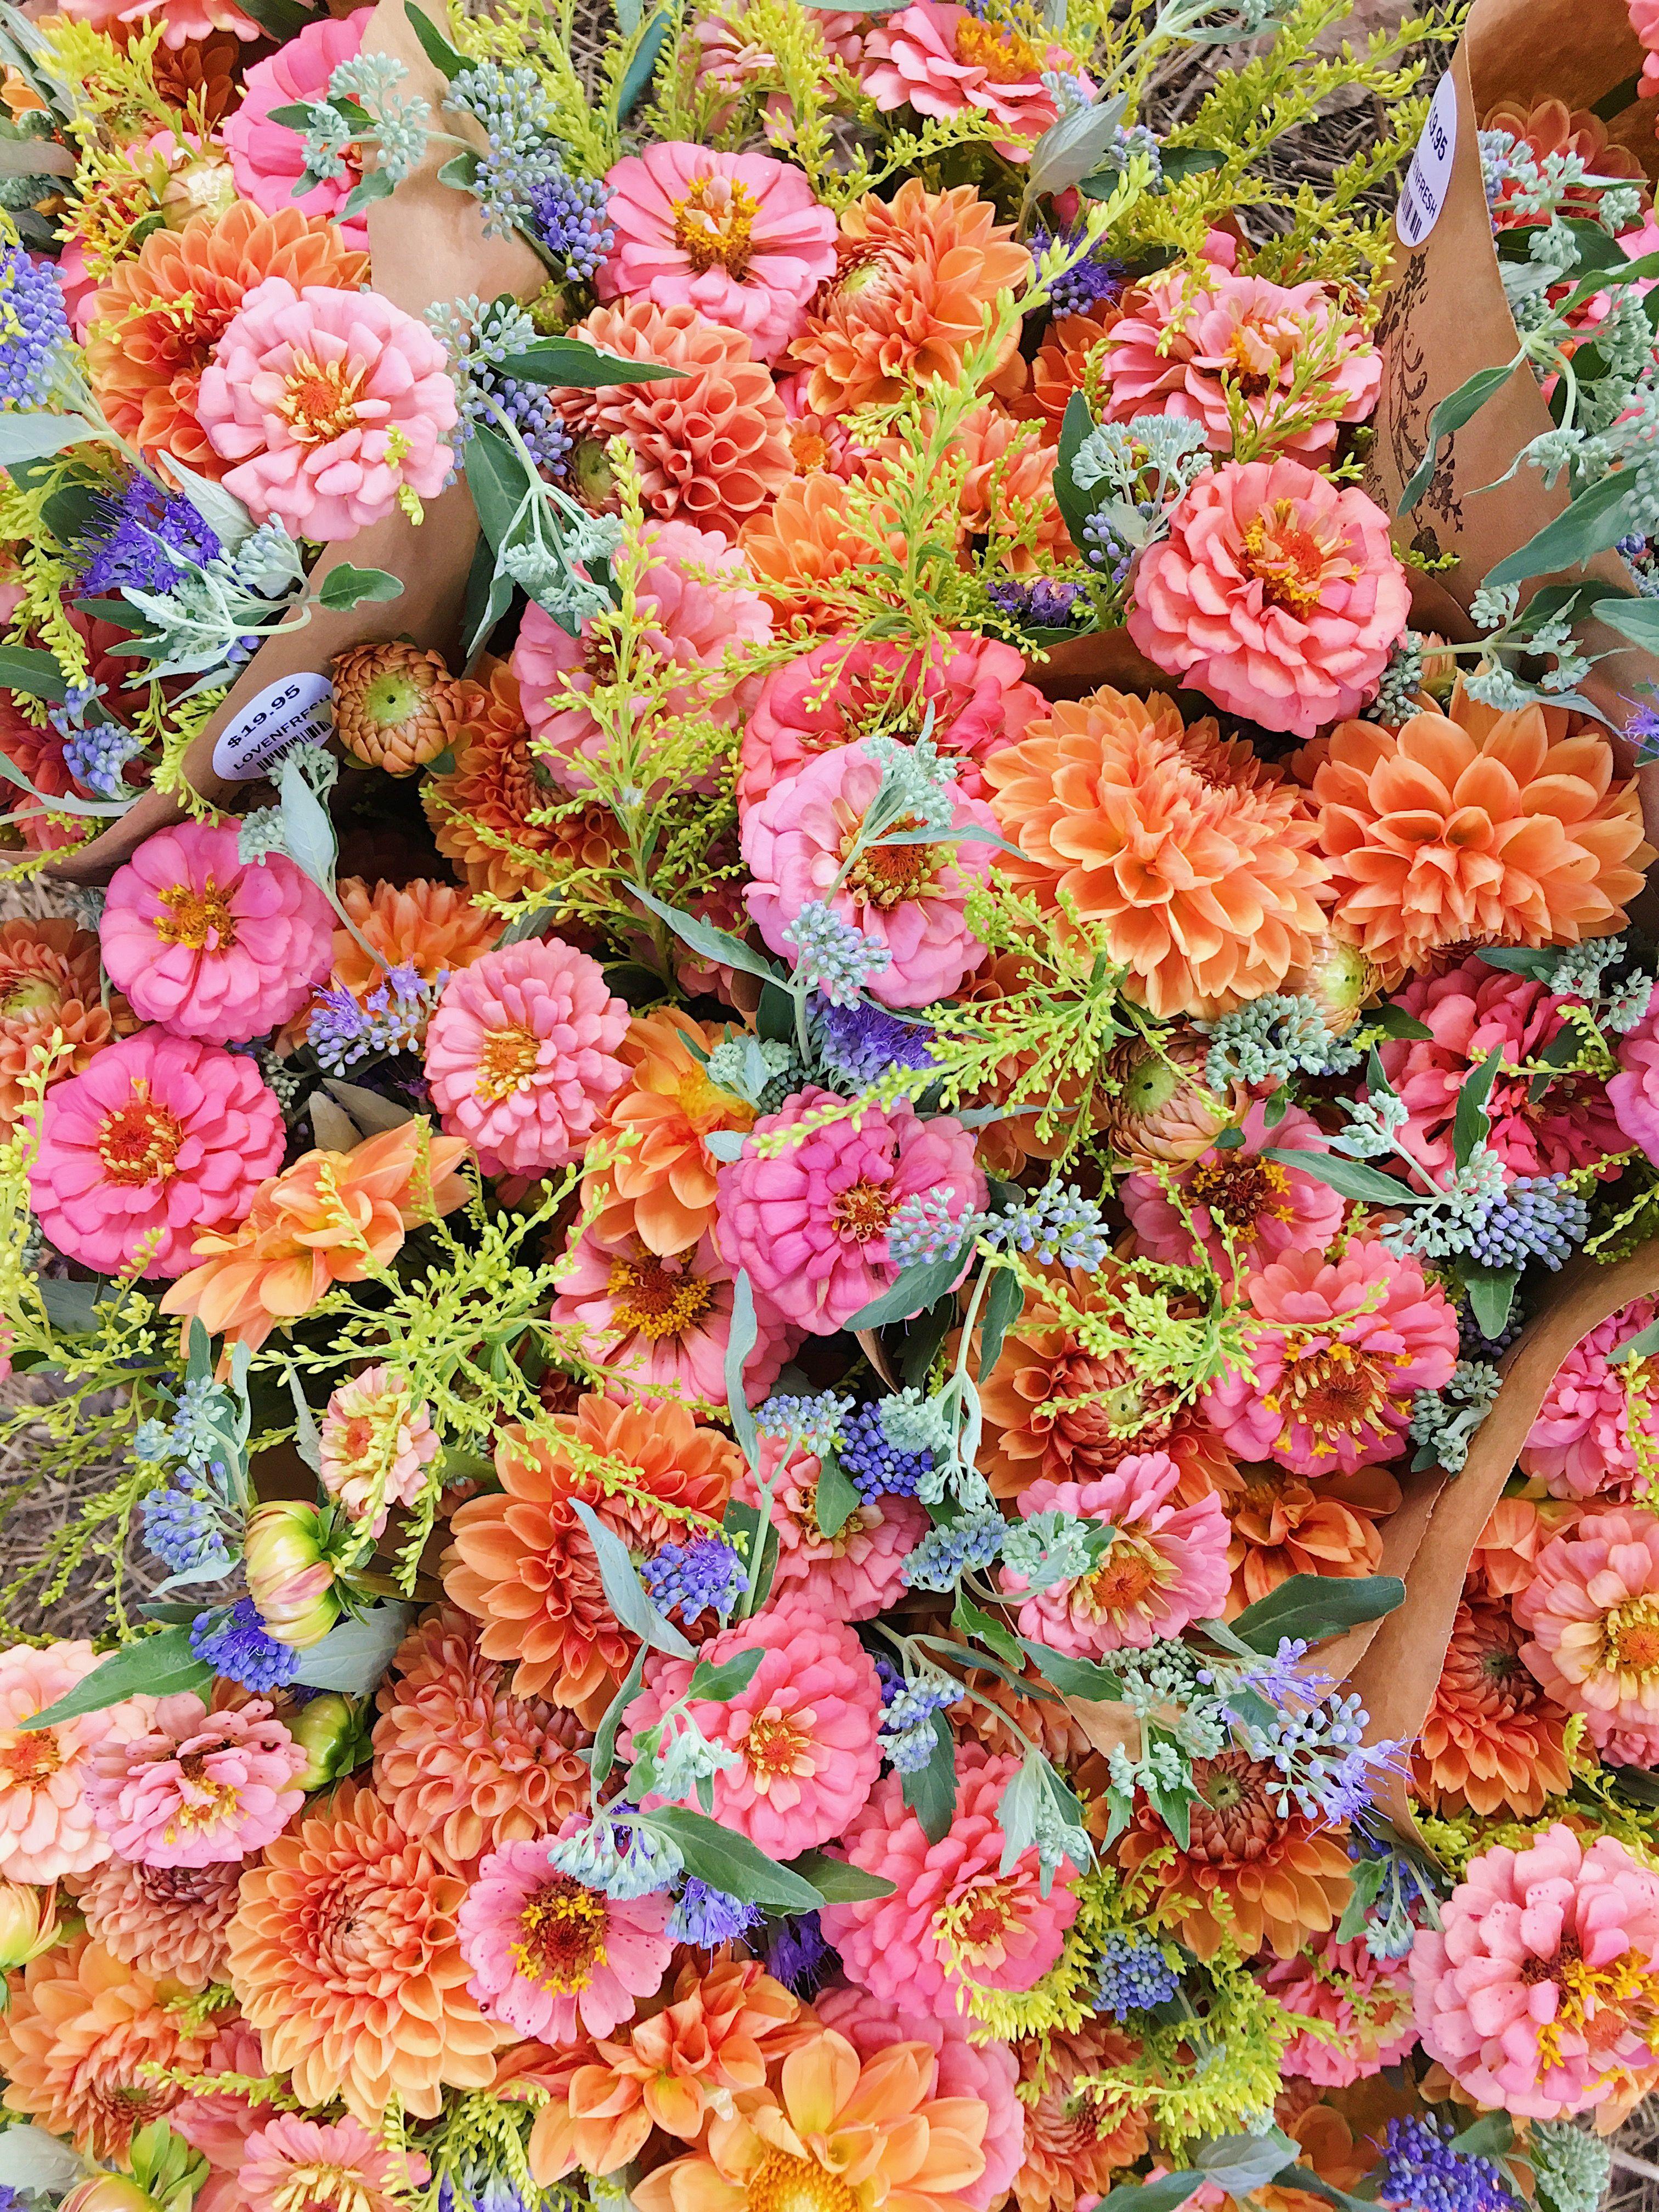 Organic Flower CSA Love 'n Fresh Flowers Flower farm